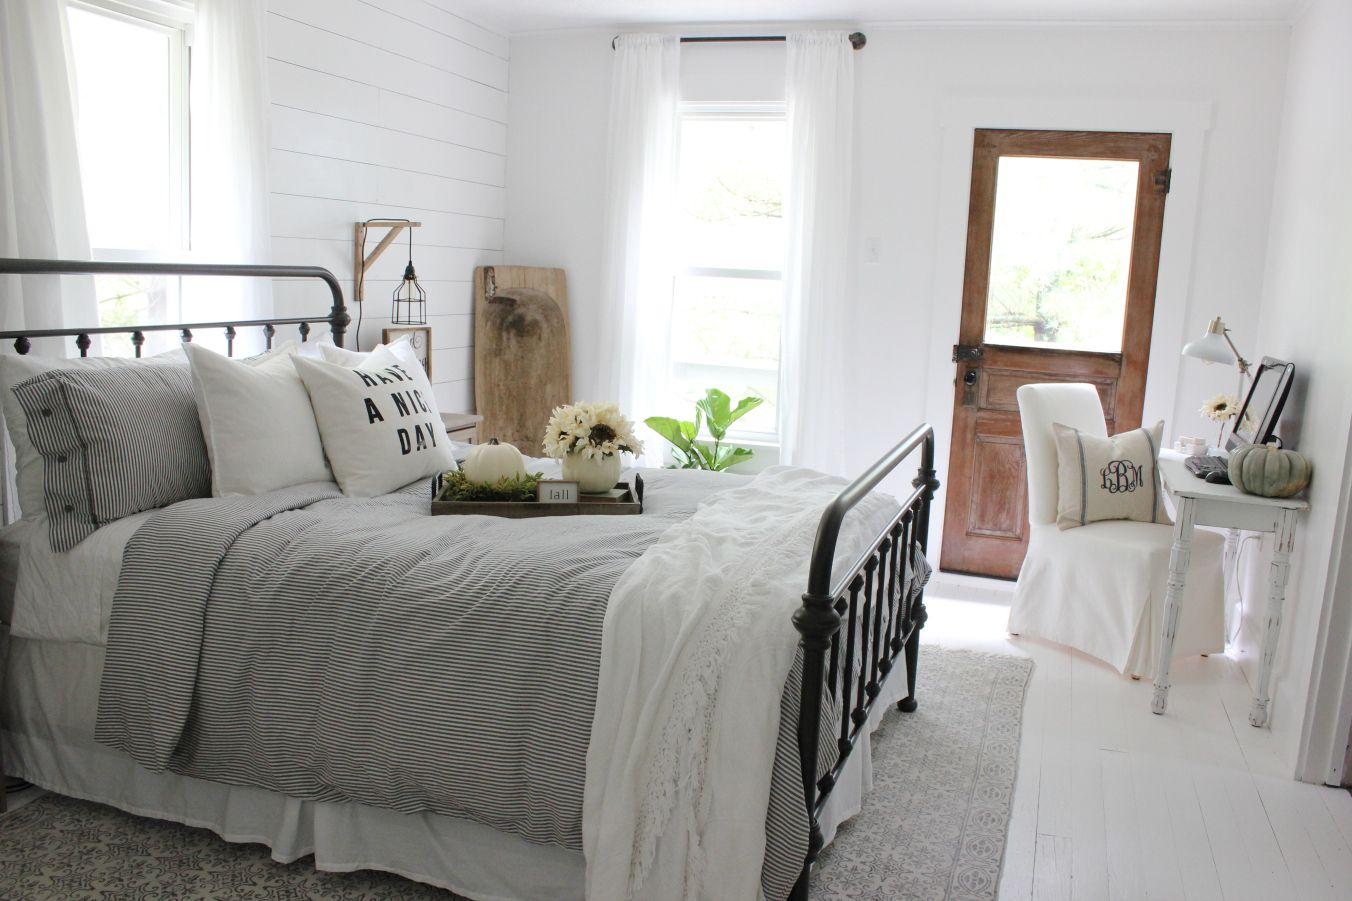 Best Favorite Farmhouse Feature Modern Farmhouse Bedroom 640 x 480